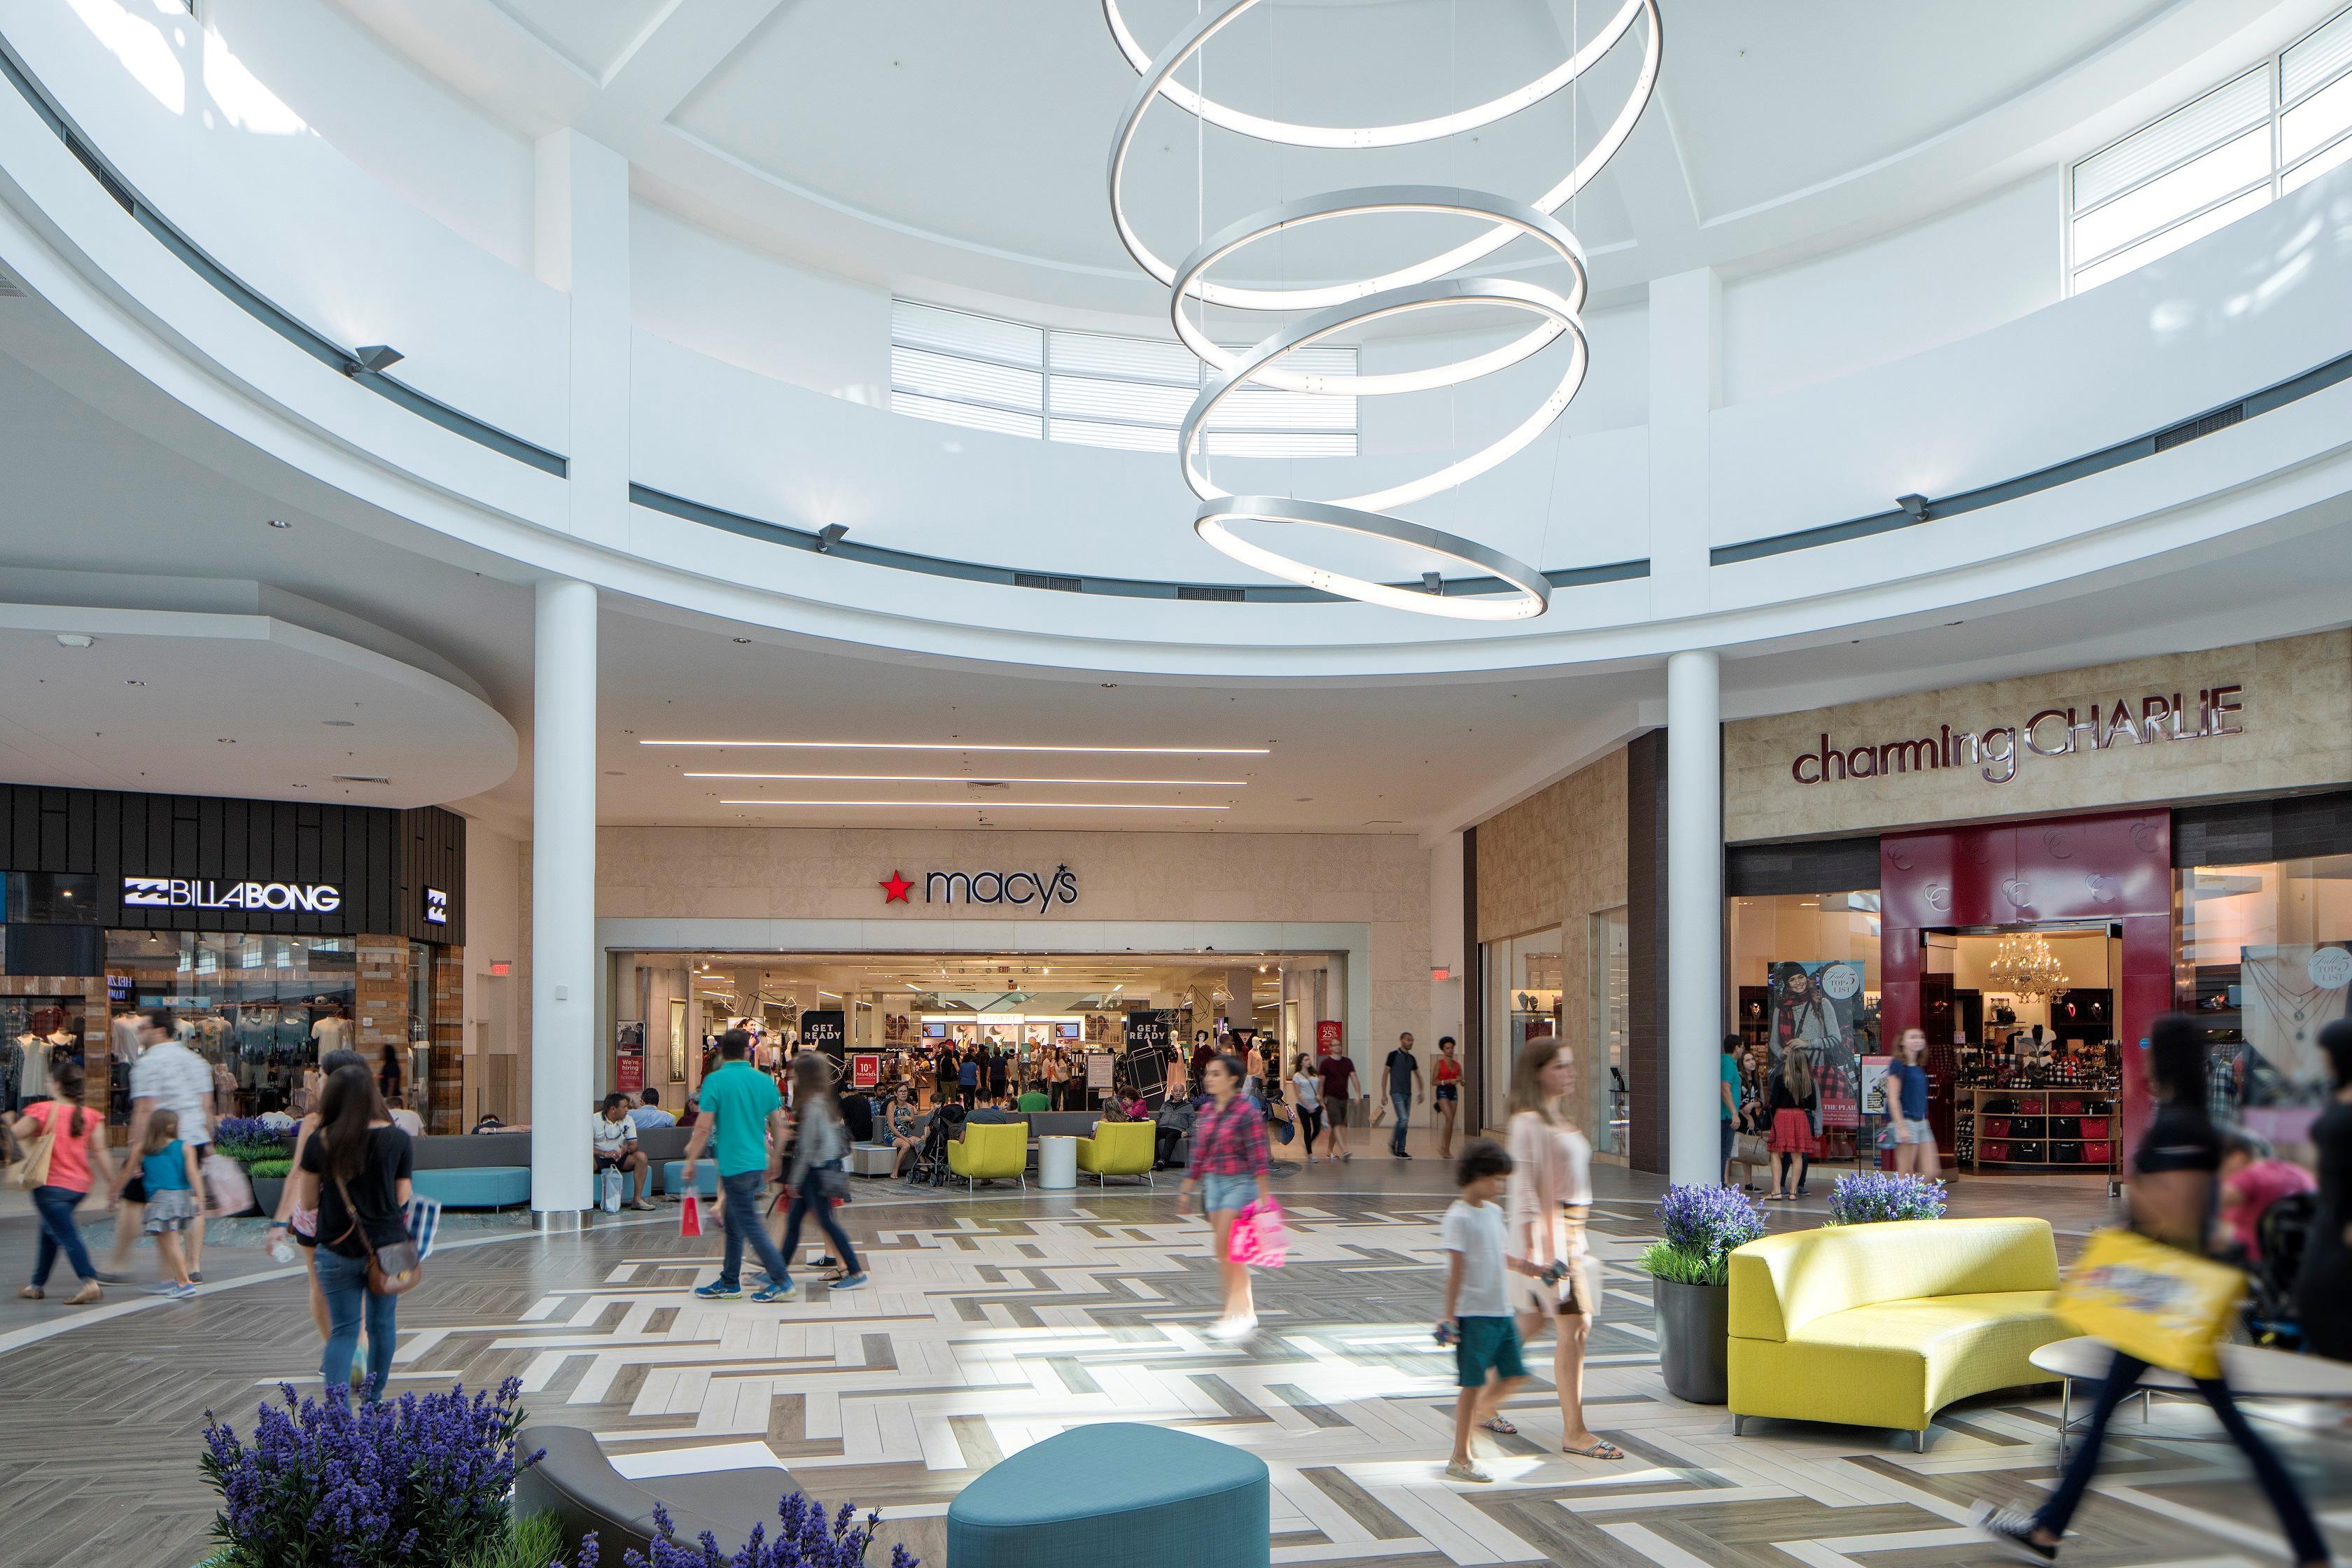 Orlando shopping coupons 2019